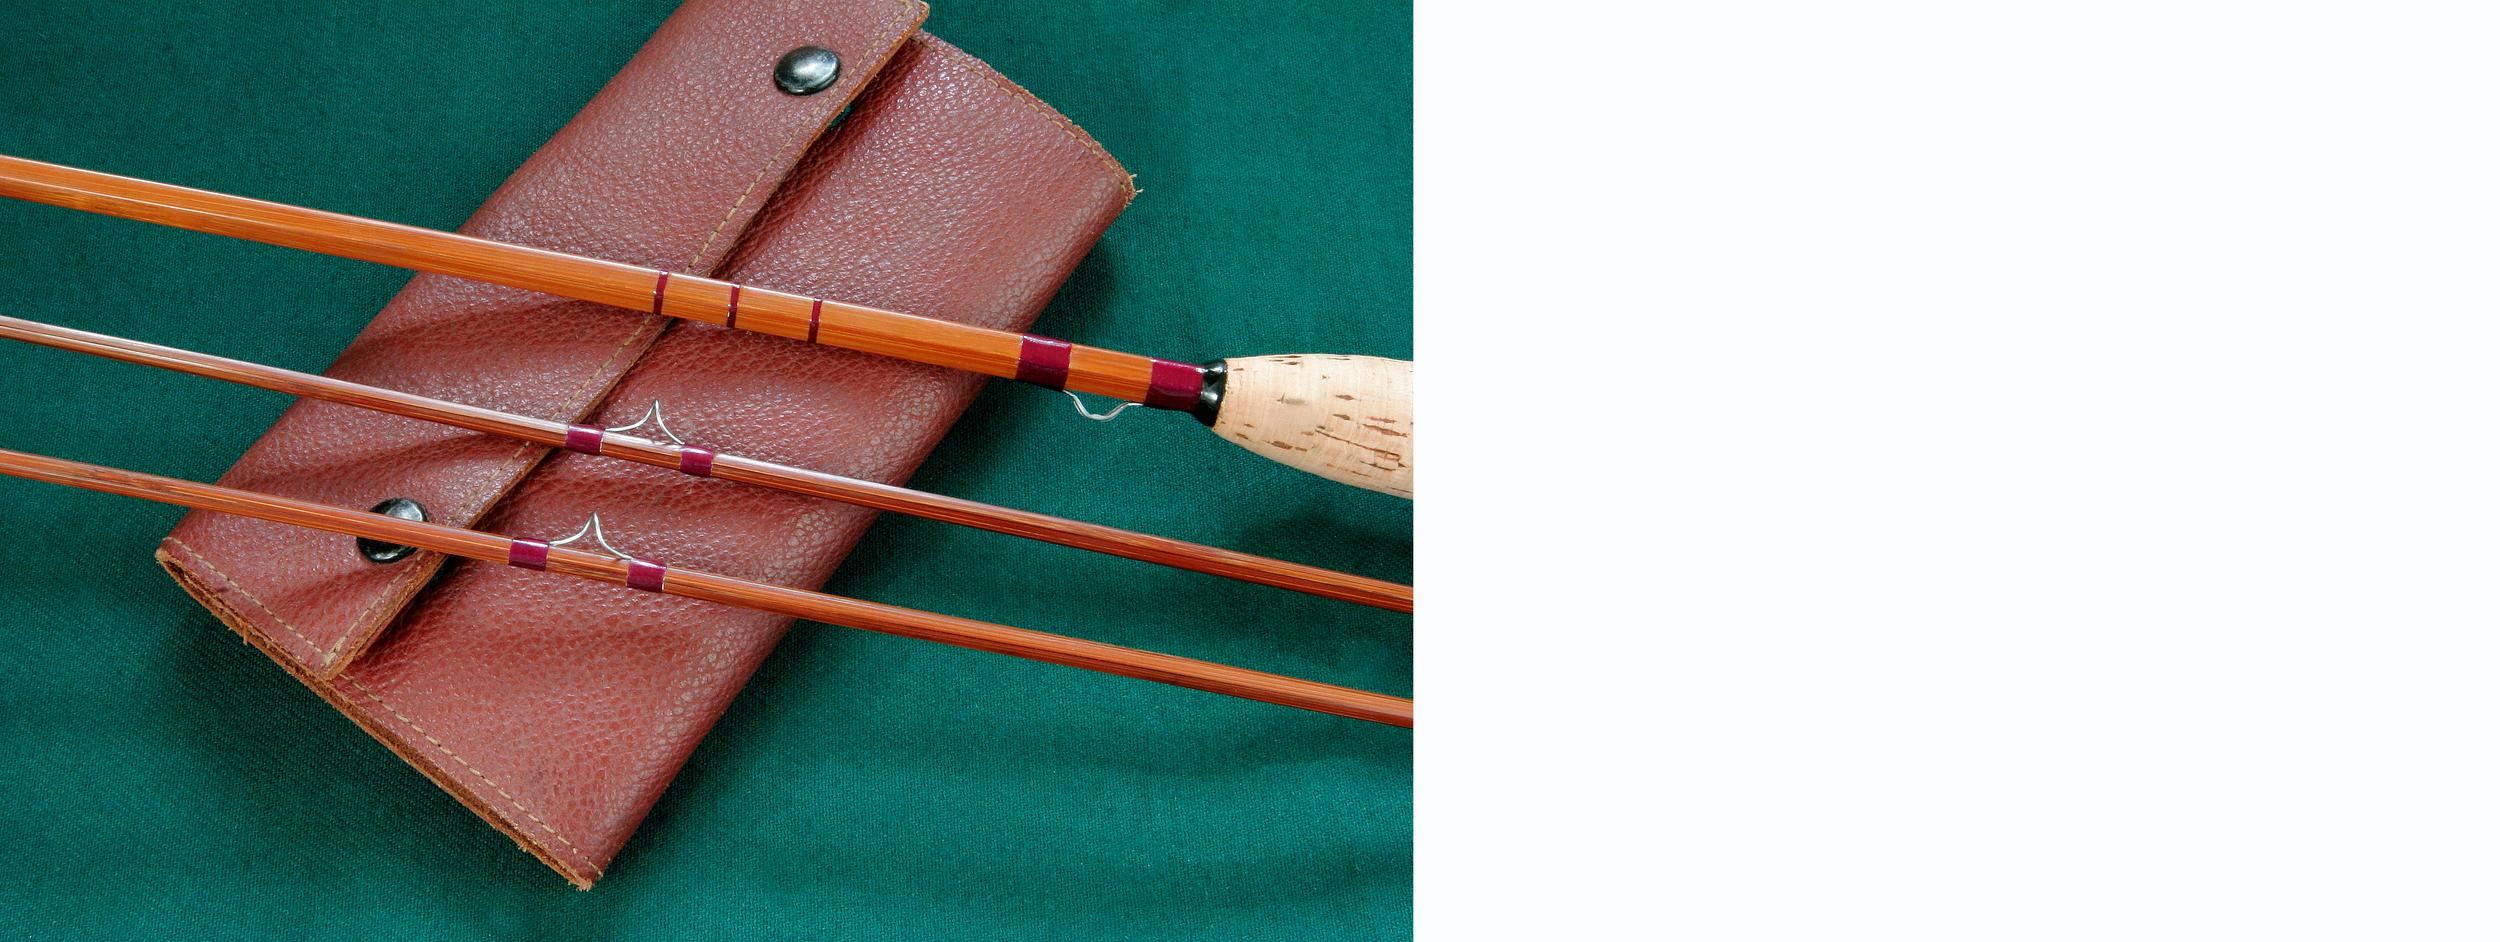 Orvis Bamboo Fly Rod, c. 1978, ebay photograph